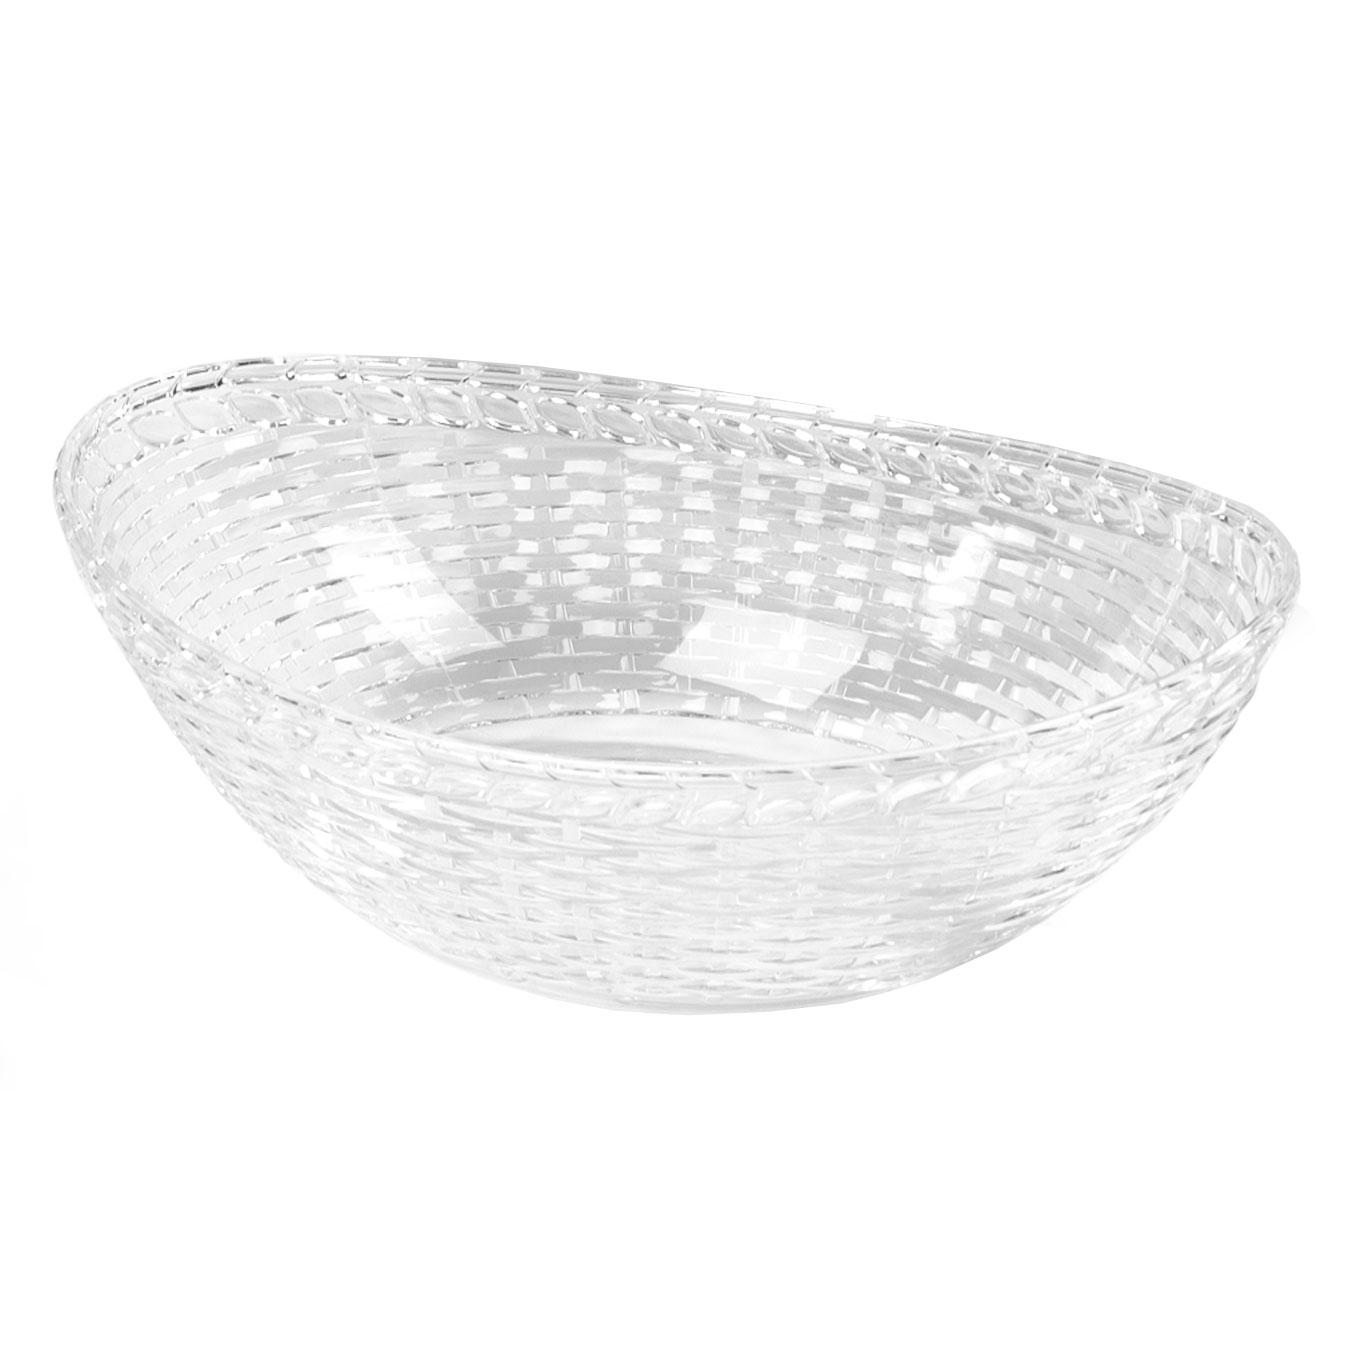 "Carlisle WB96507 Oval Basket - 9.43"" x 6.625"", Polycarbonate, Clear"